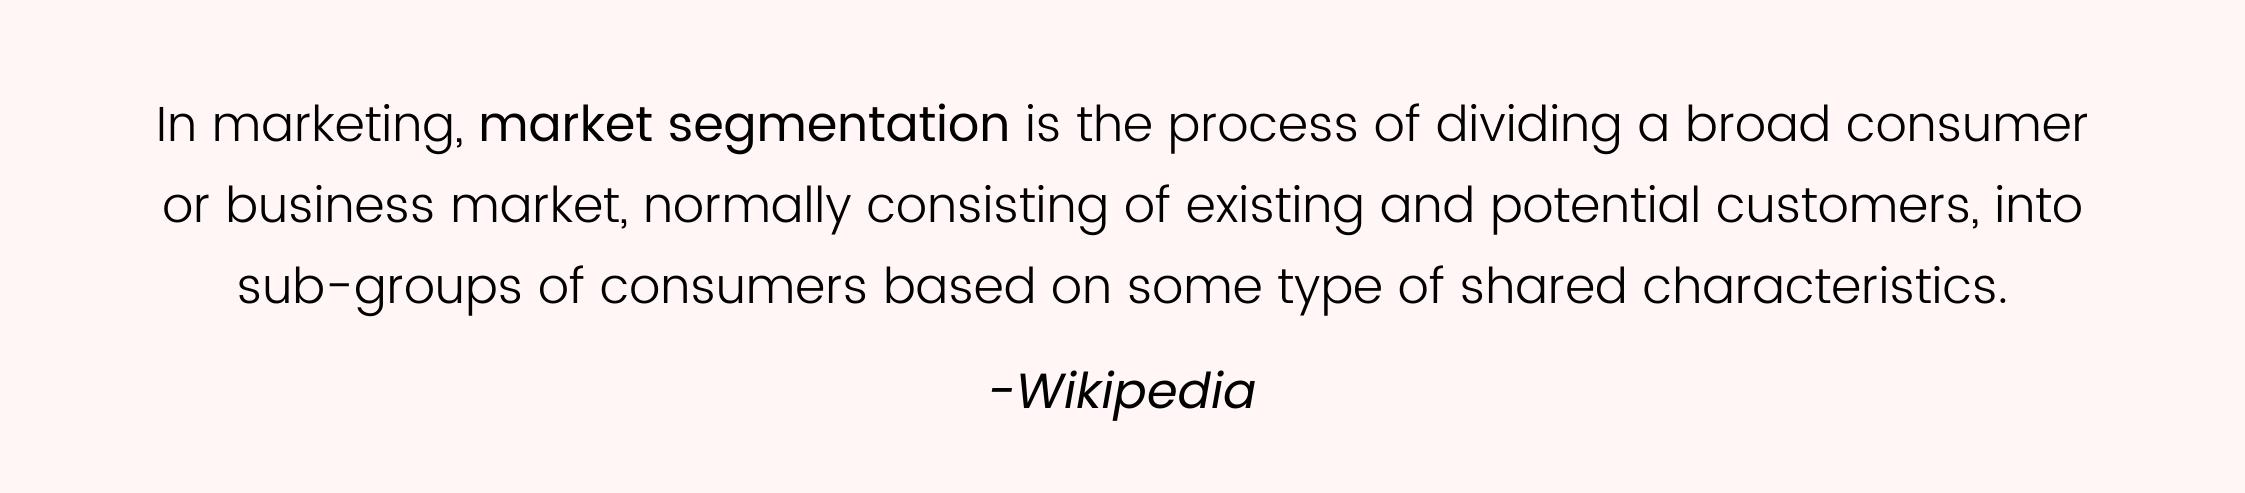 Wikipedia segmentation